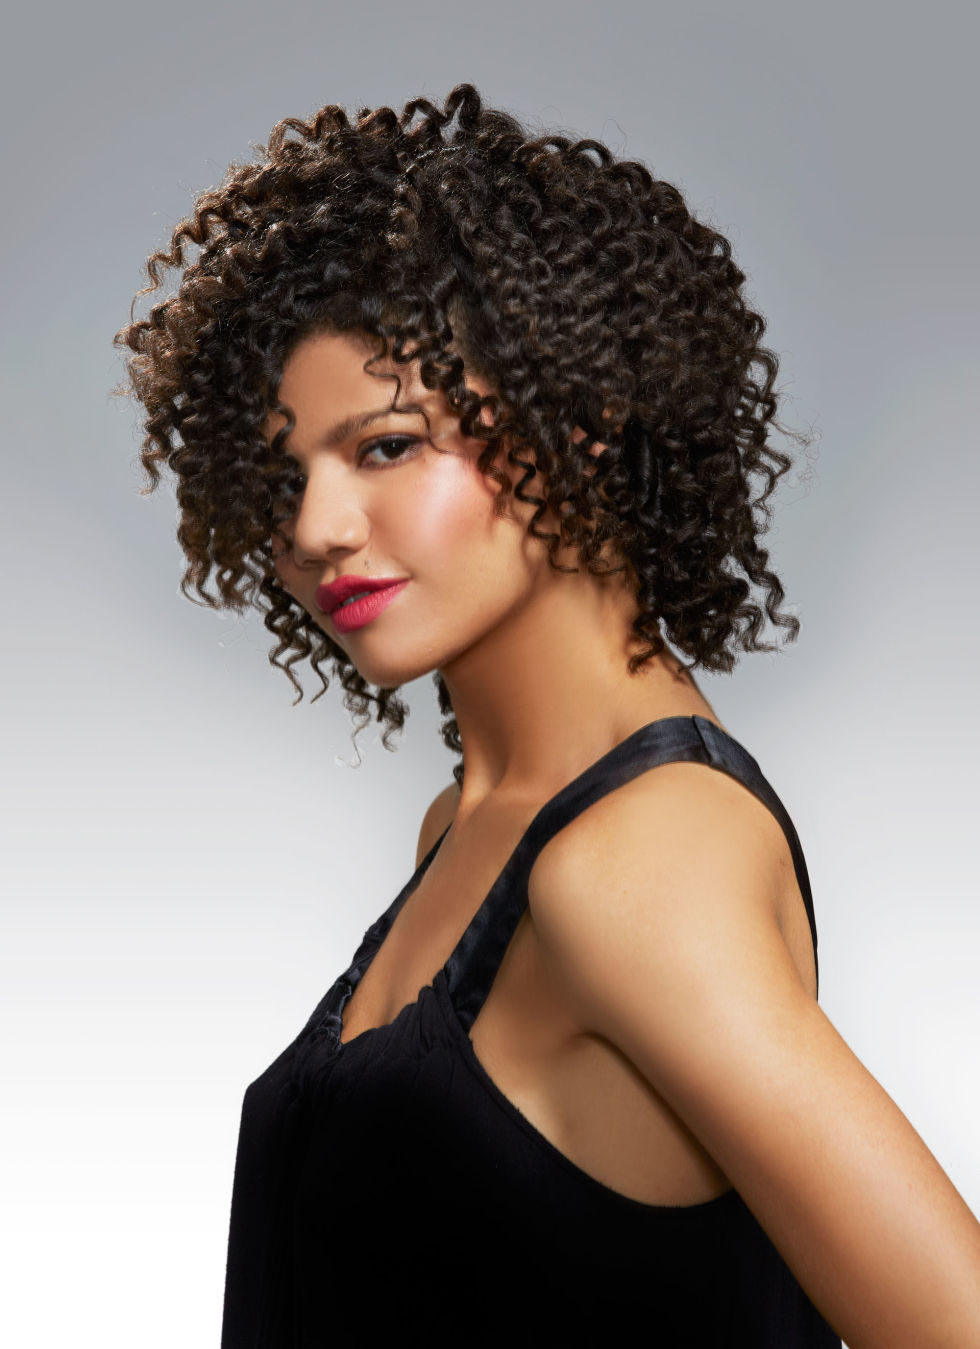 Wondrous 29 Black Hairstyles Best African American Hairstyles Amp Haircuts Short Hairstyles For Black Women Fulllsitofus